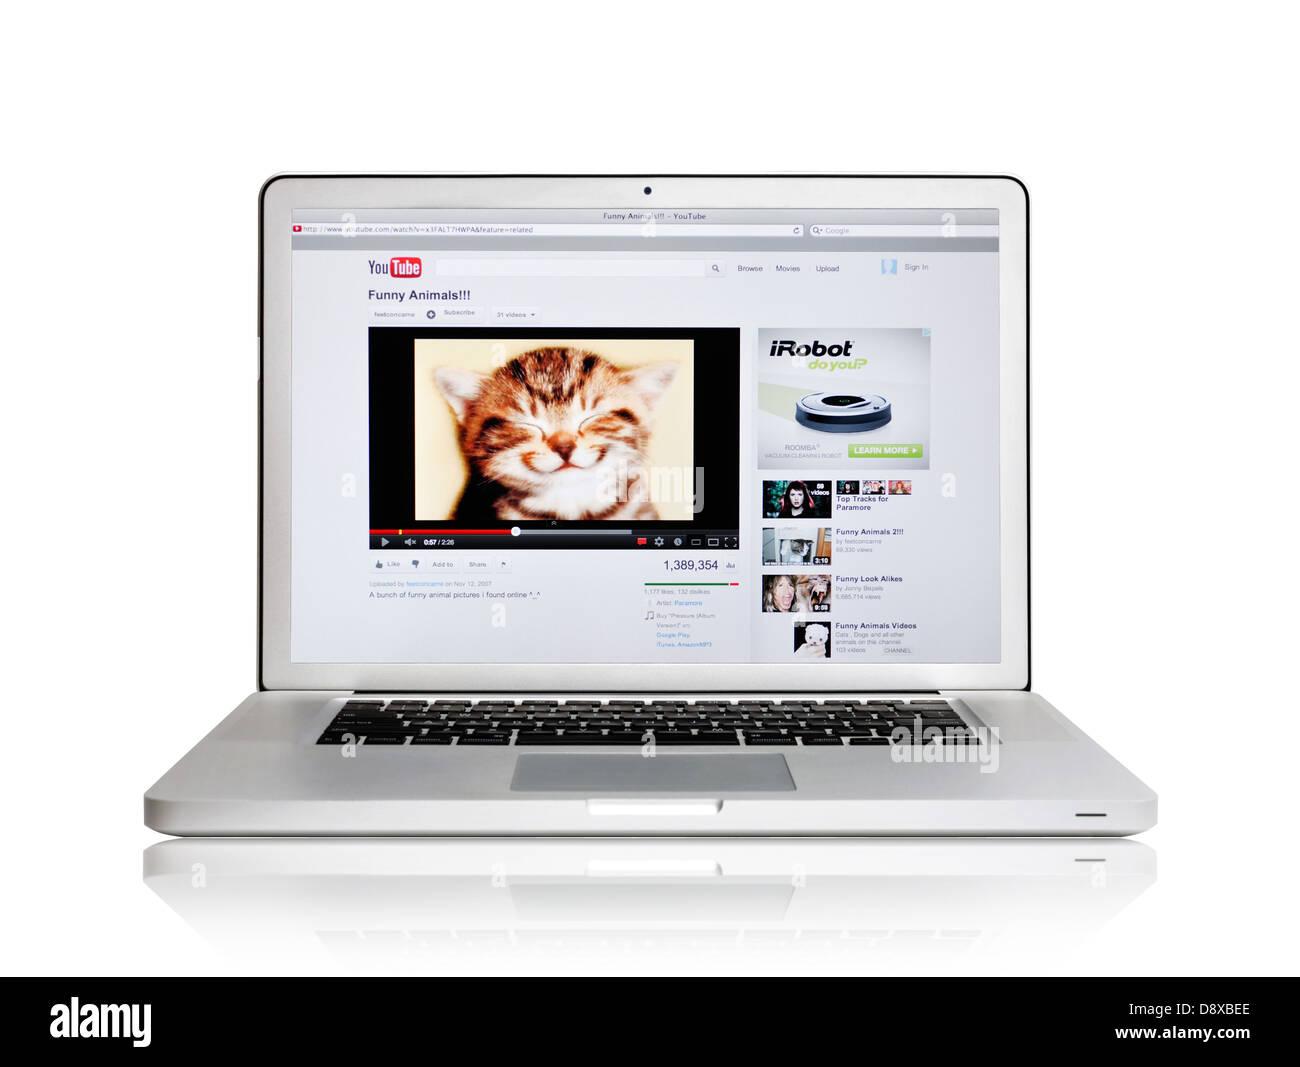 Lustige Video Website Youtube Auf Laptop Bildschirm Stockfoto Bild